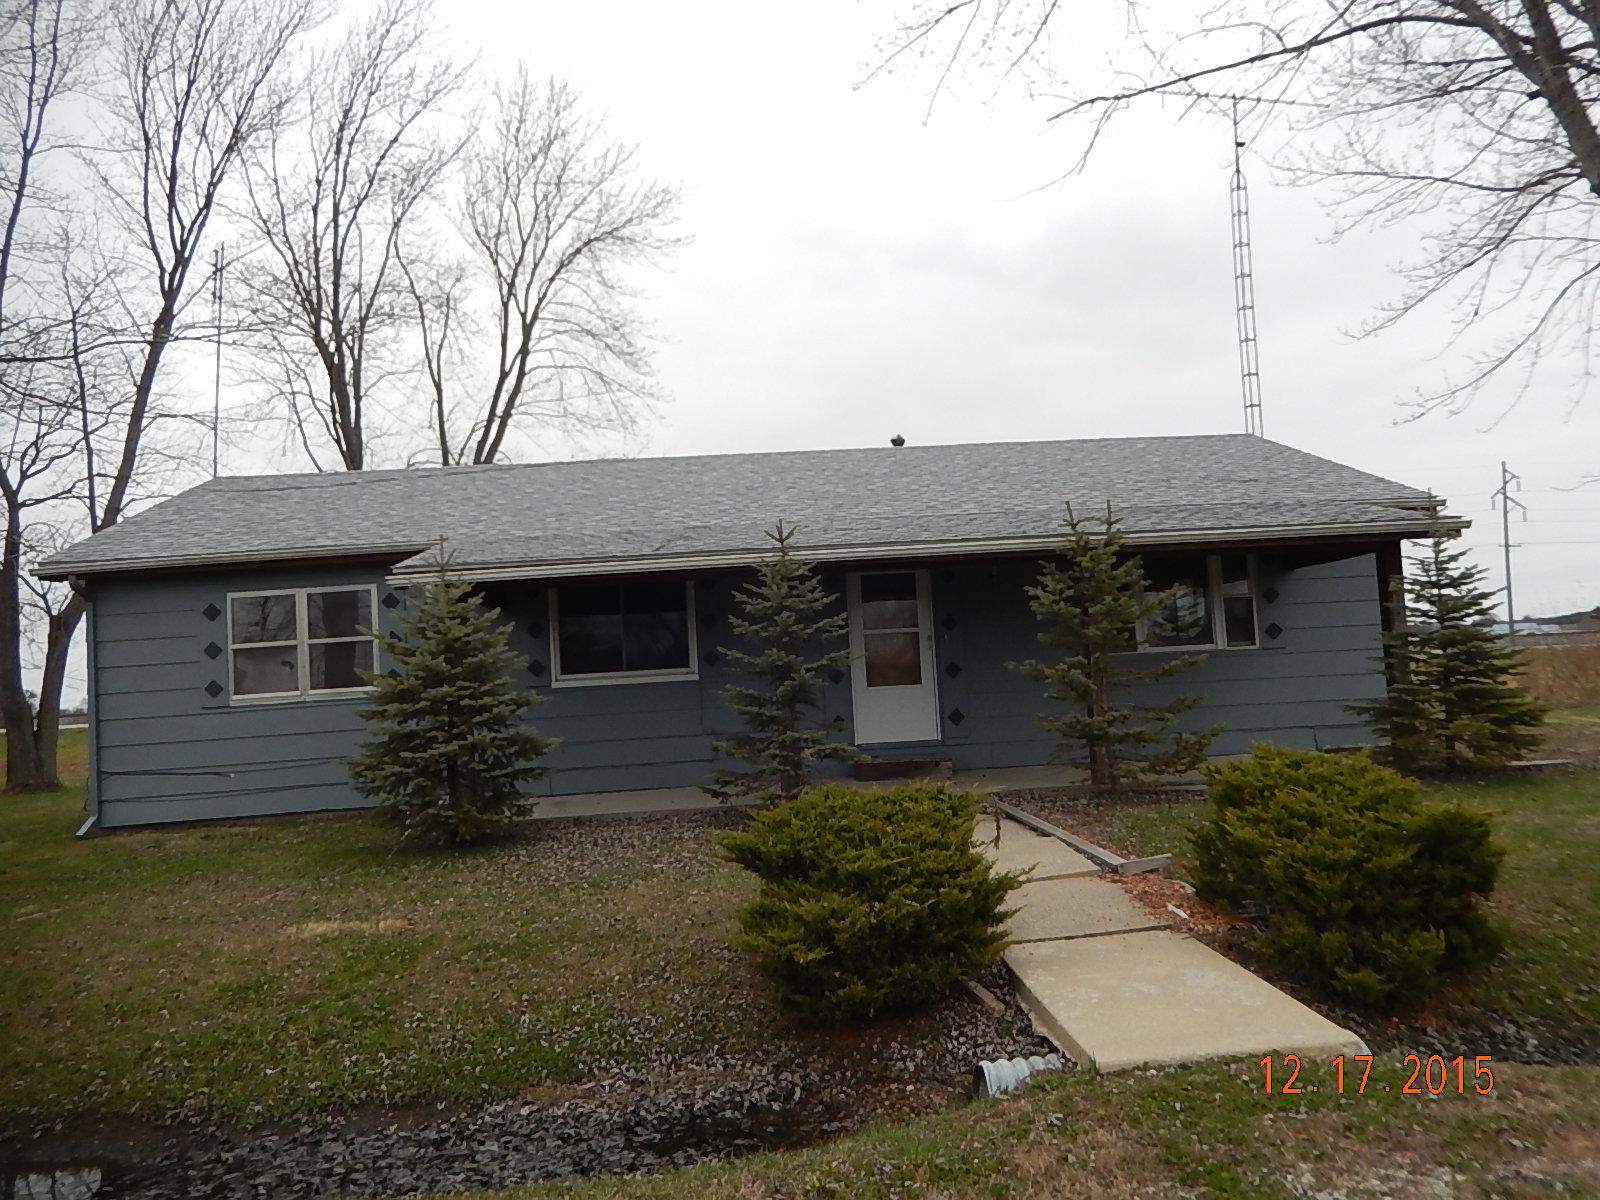 1826 Minnesota Ave, Mulberry Grove, Illinois 62262